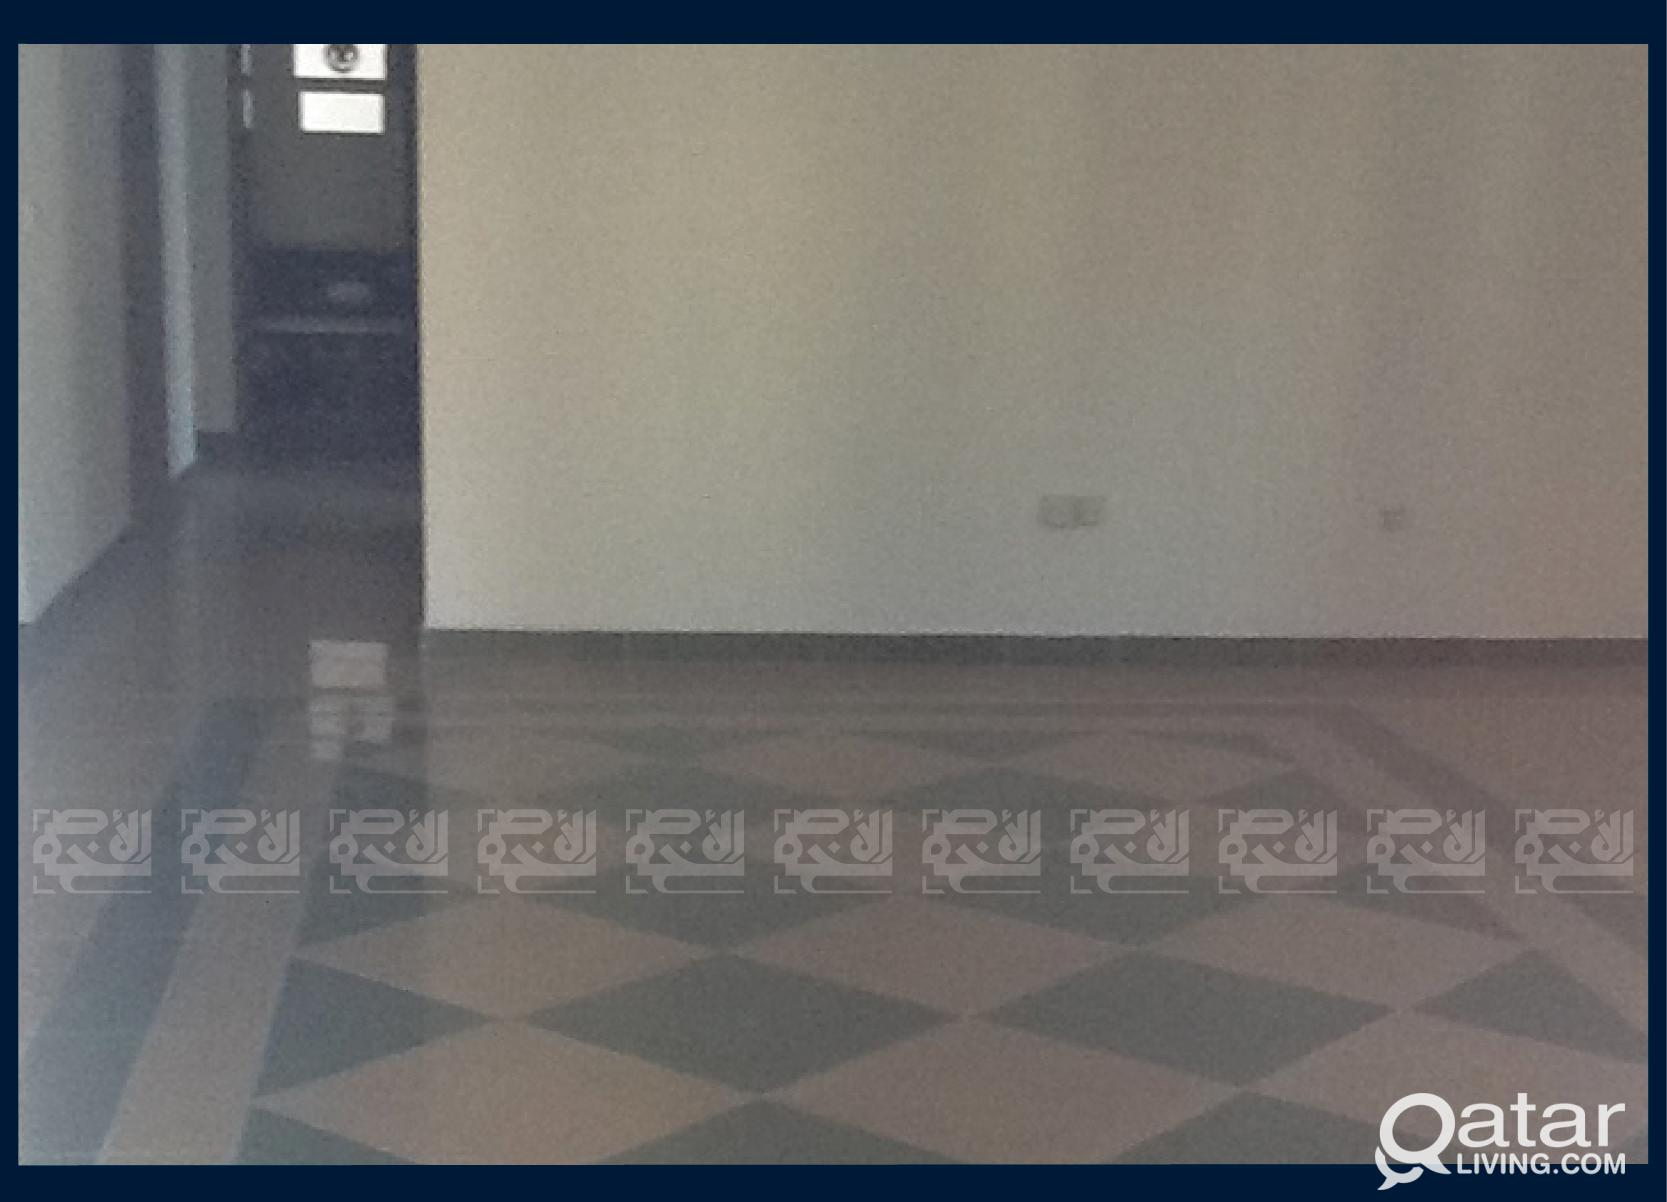 Spacious Unfurnished 3-Bedroom Apt in Musheireb